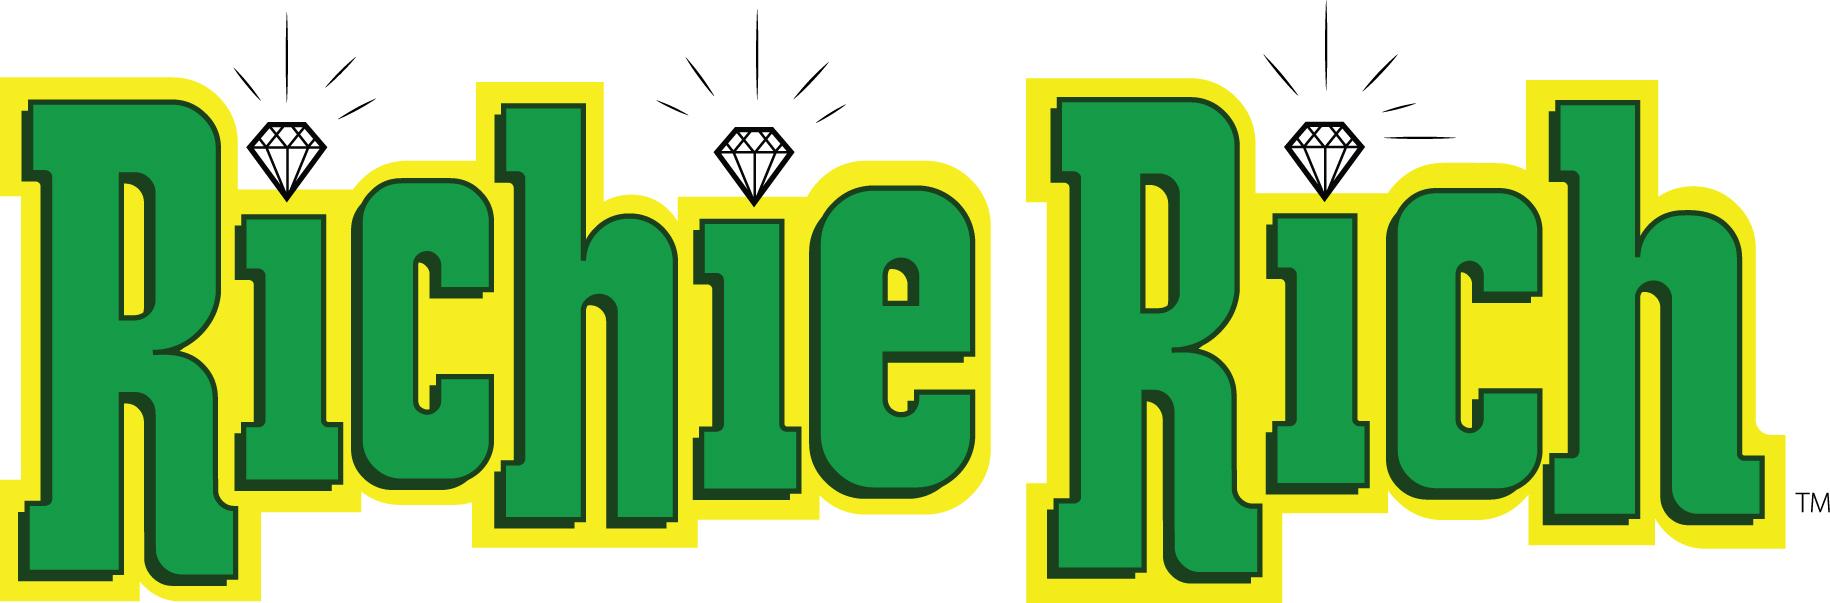 RunKit + npm: richie.